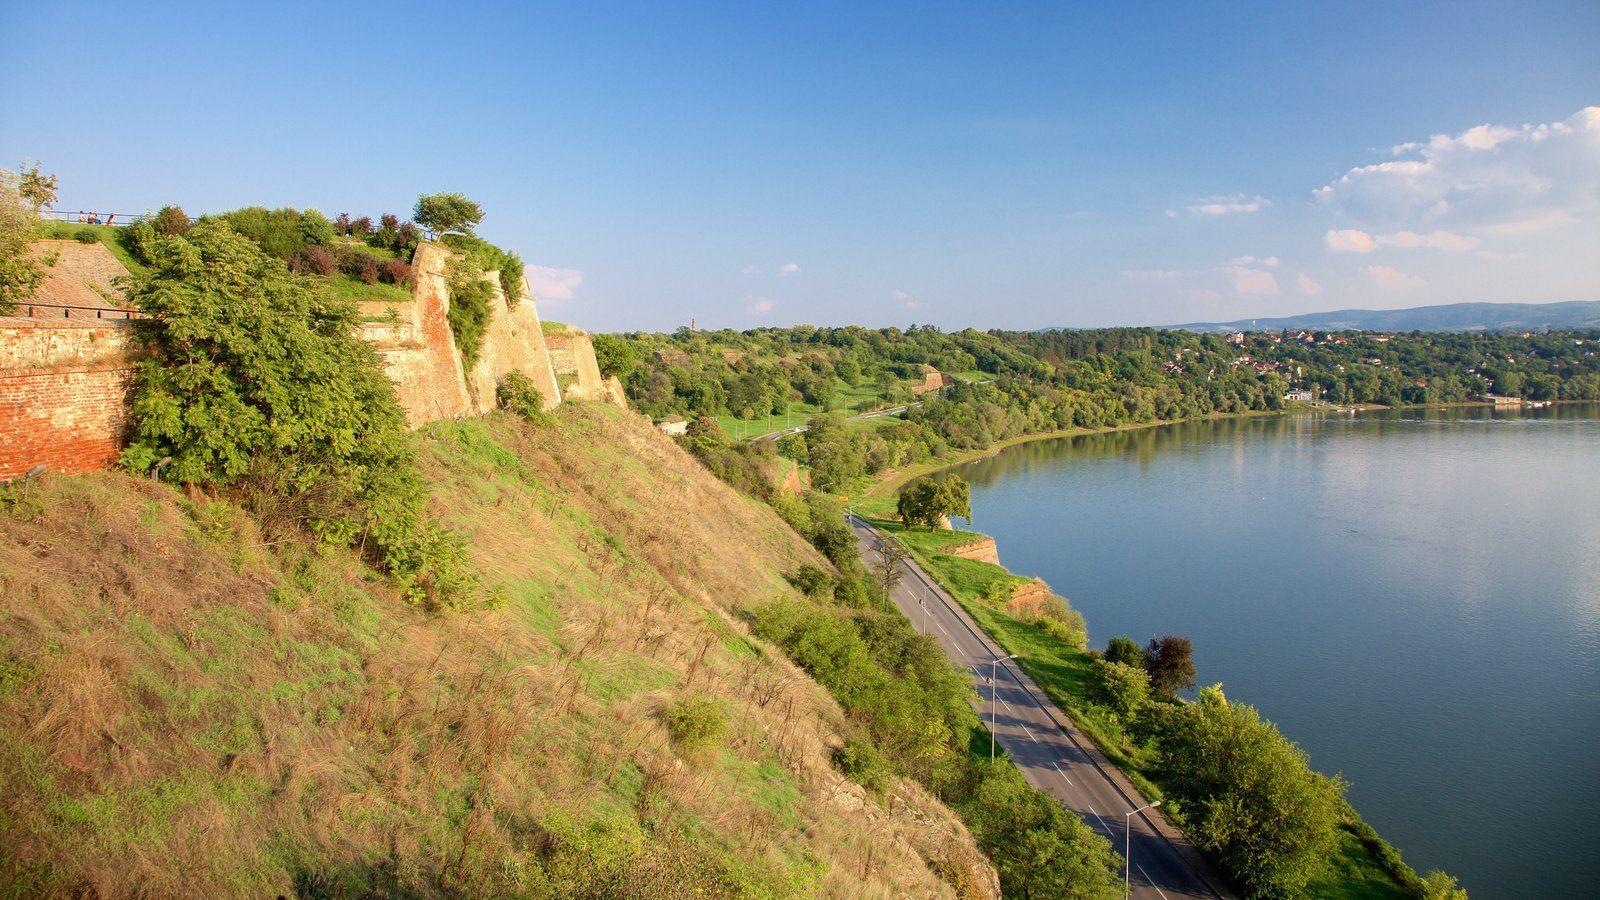 Petrovaradin fortress (Петроварадин, Day 7)